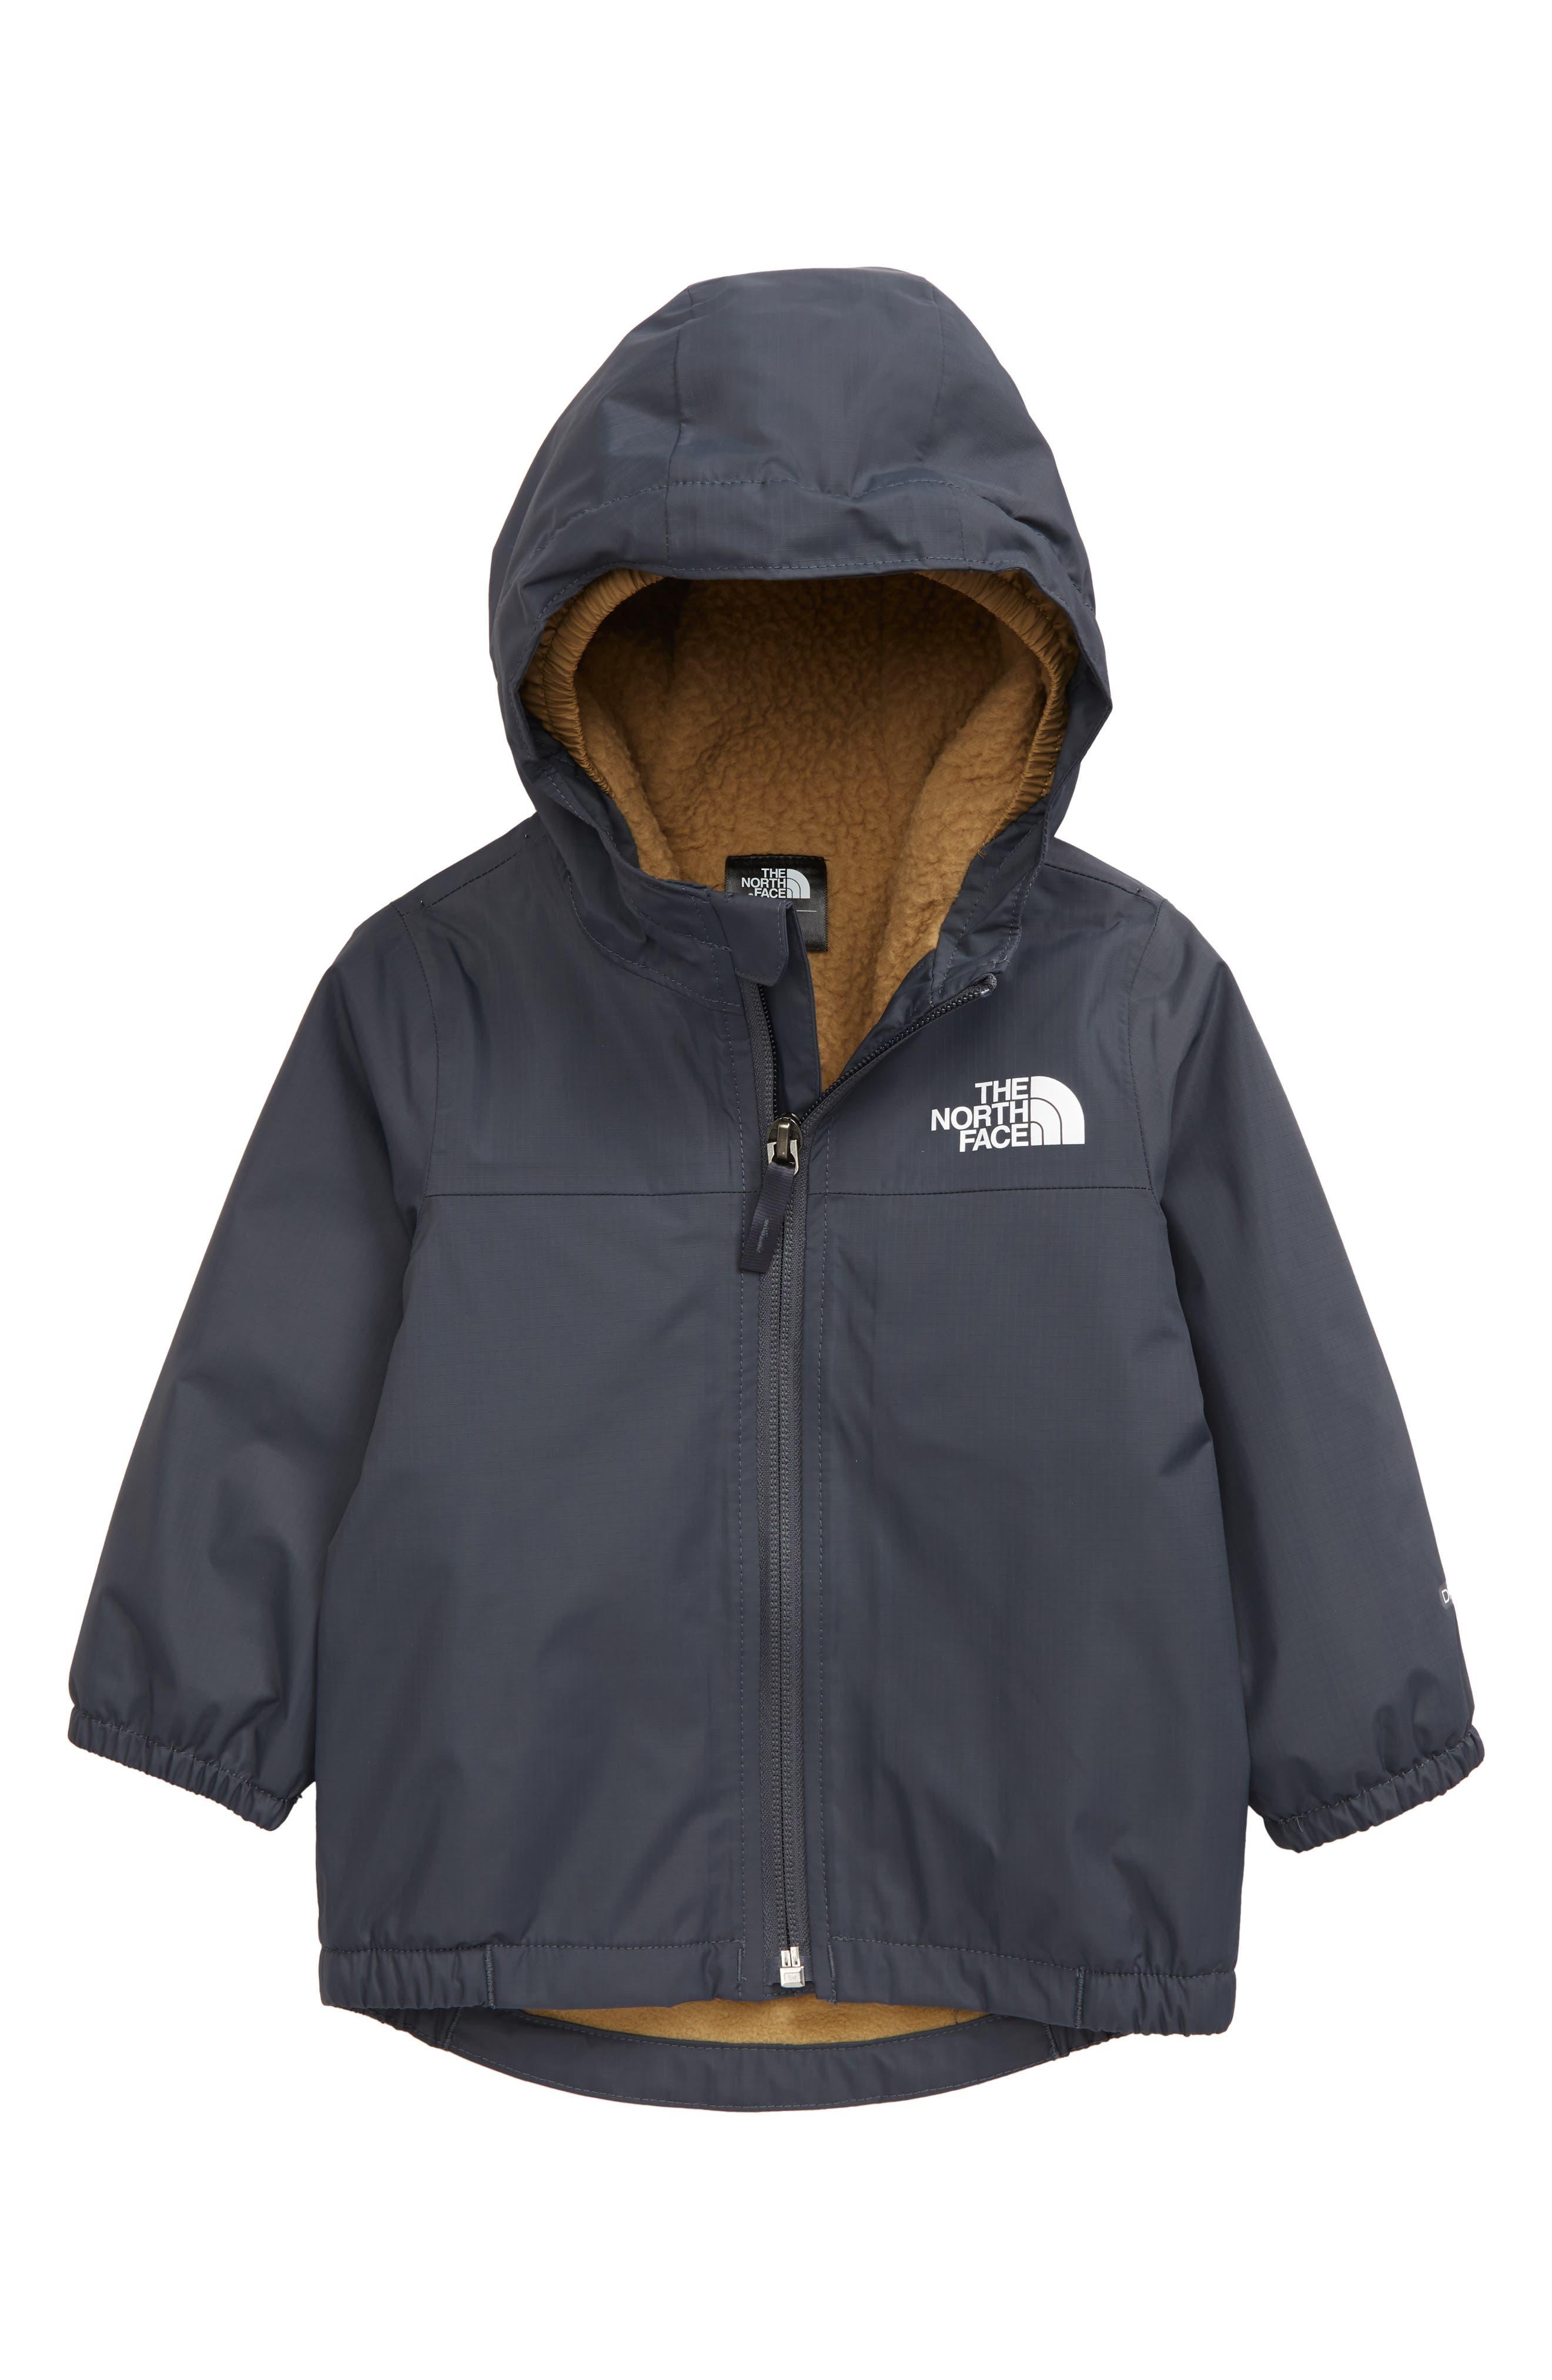 The North Face Infant Warm Storm Rain Jacket - 6-12M - Vanadis Grey